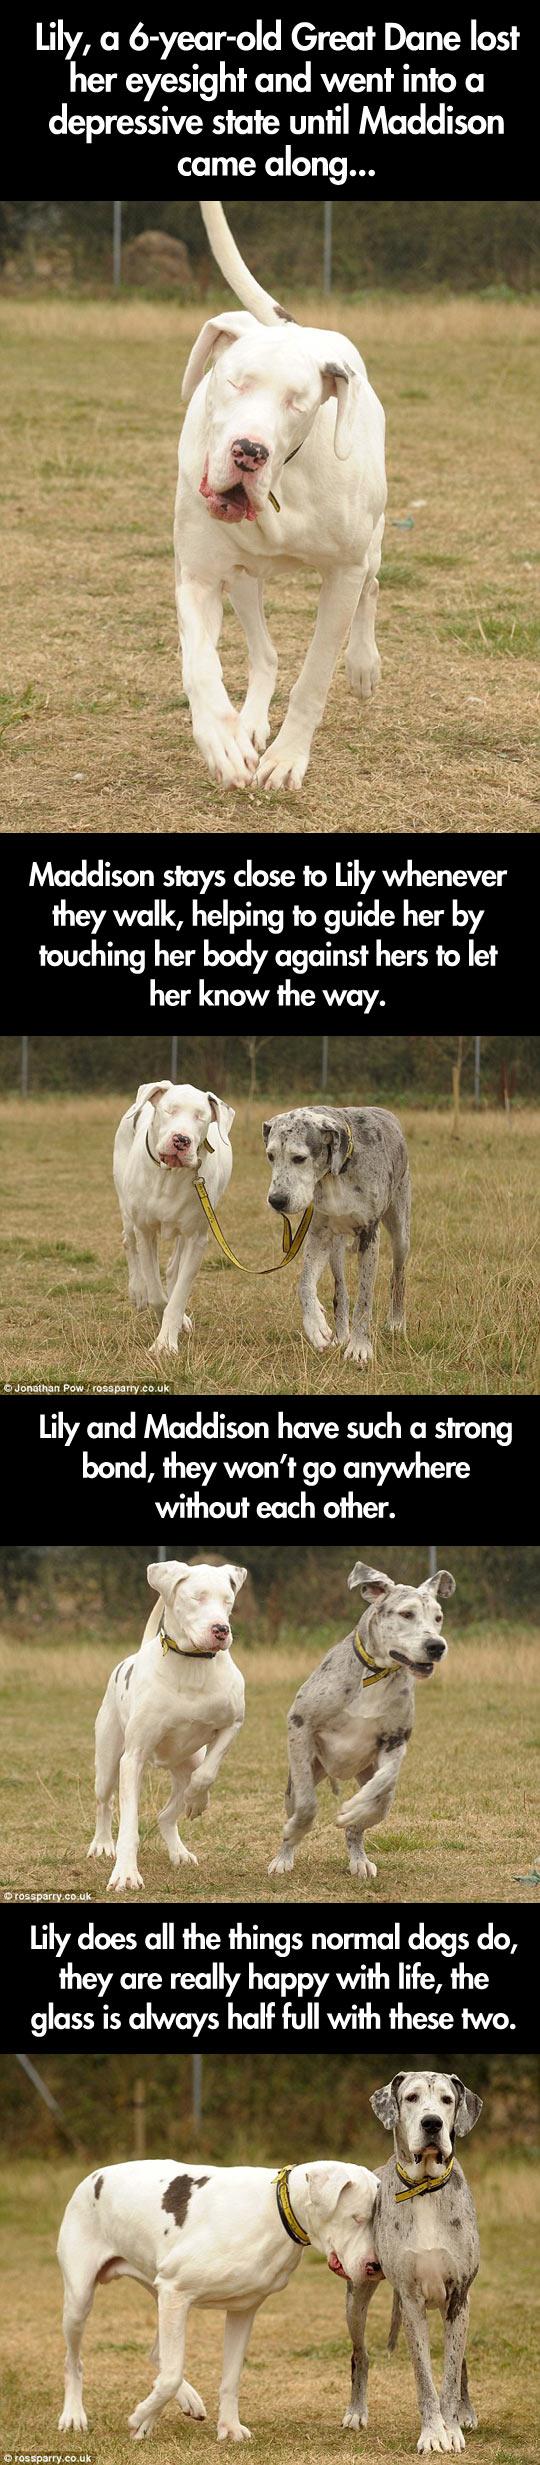 cool-blind-dog-guide-Great-Dane